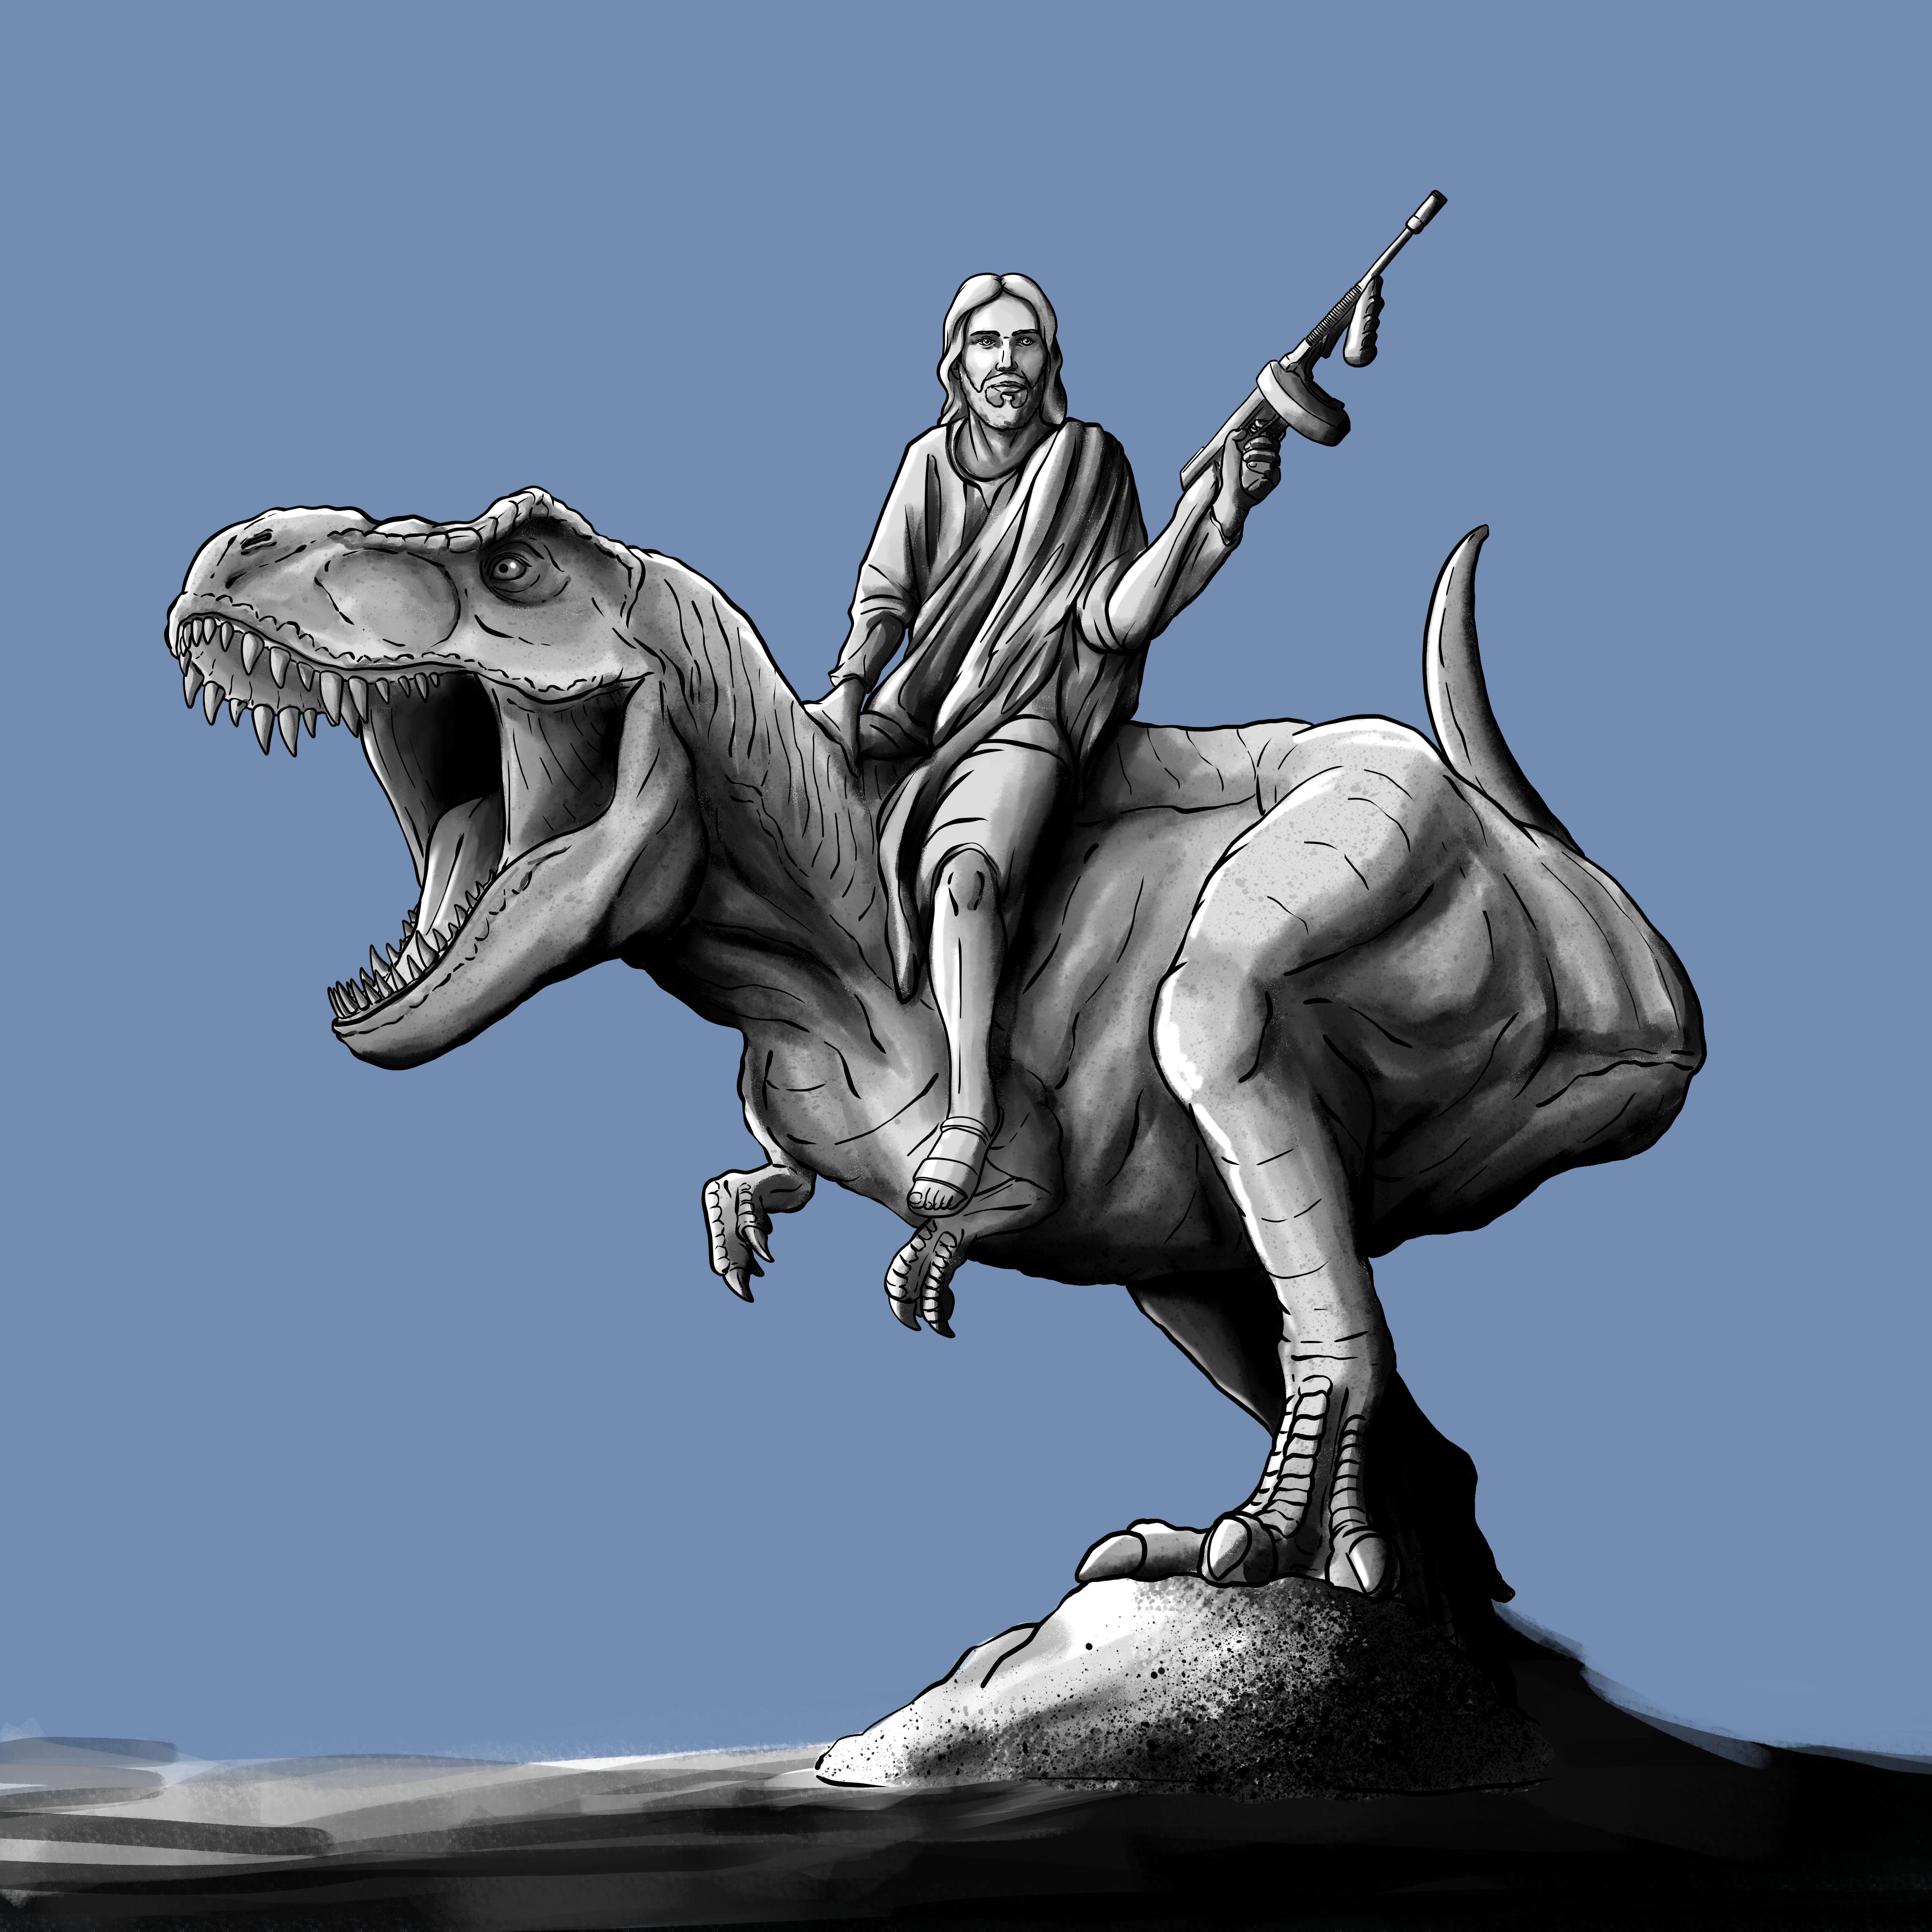 Jesus Rode a Dinosaur